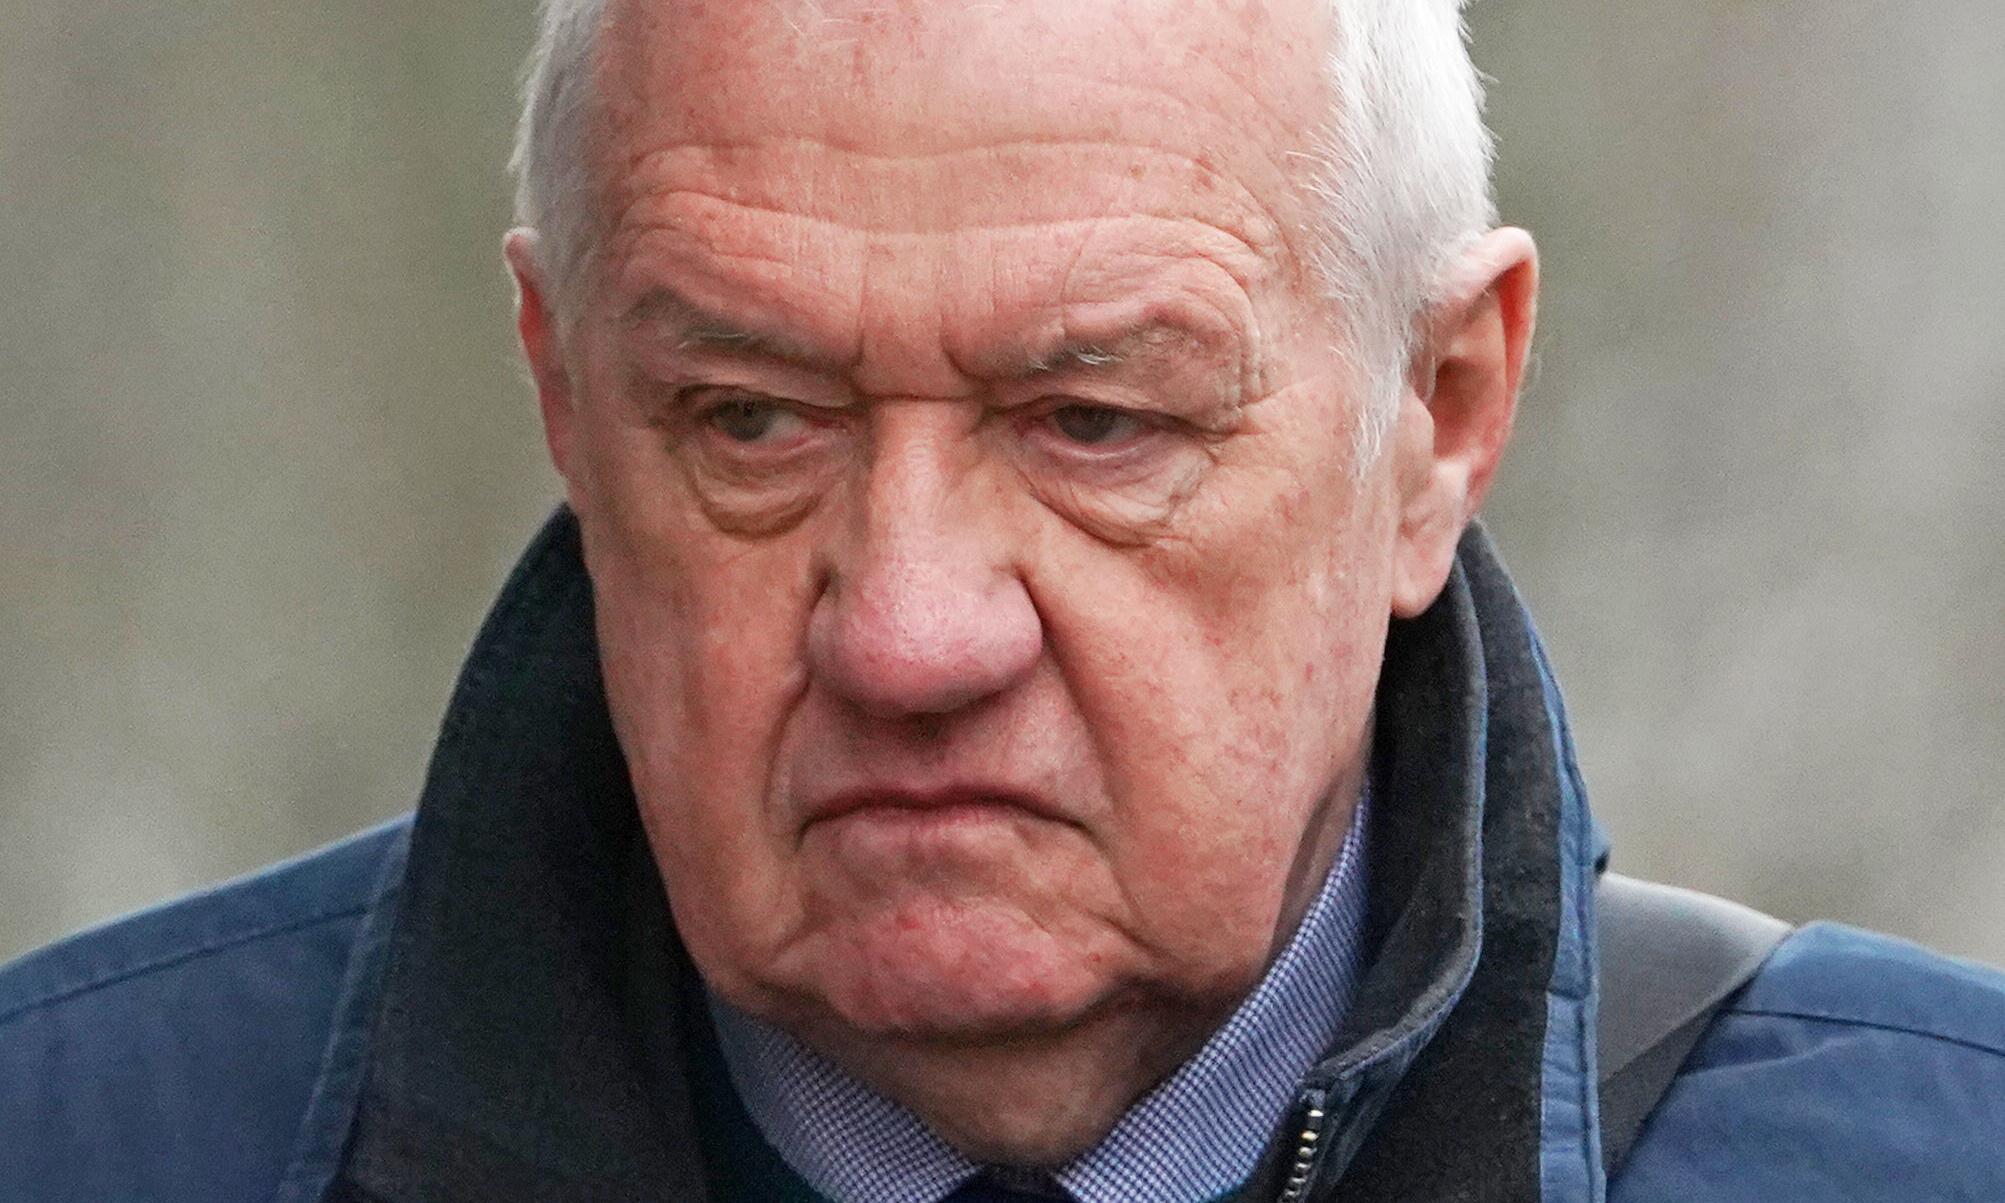 Hillsborough police chief will face retrial, judge rules